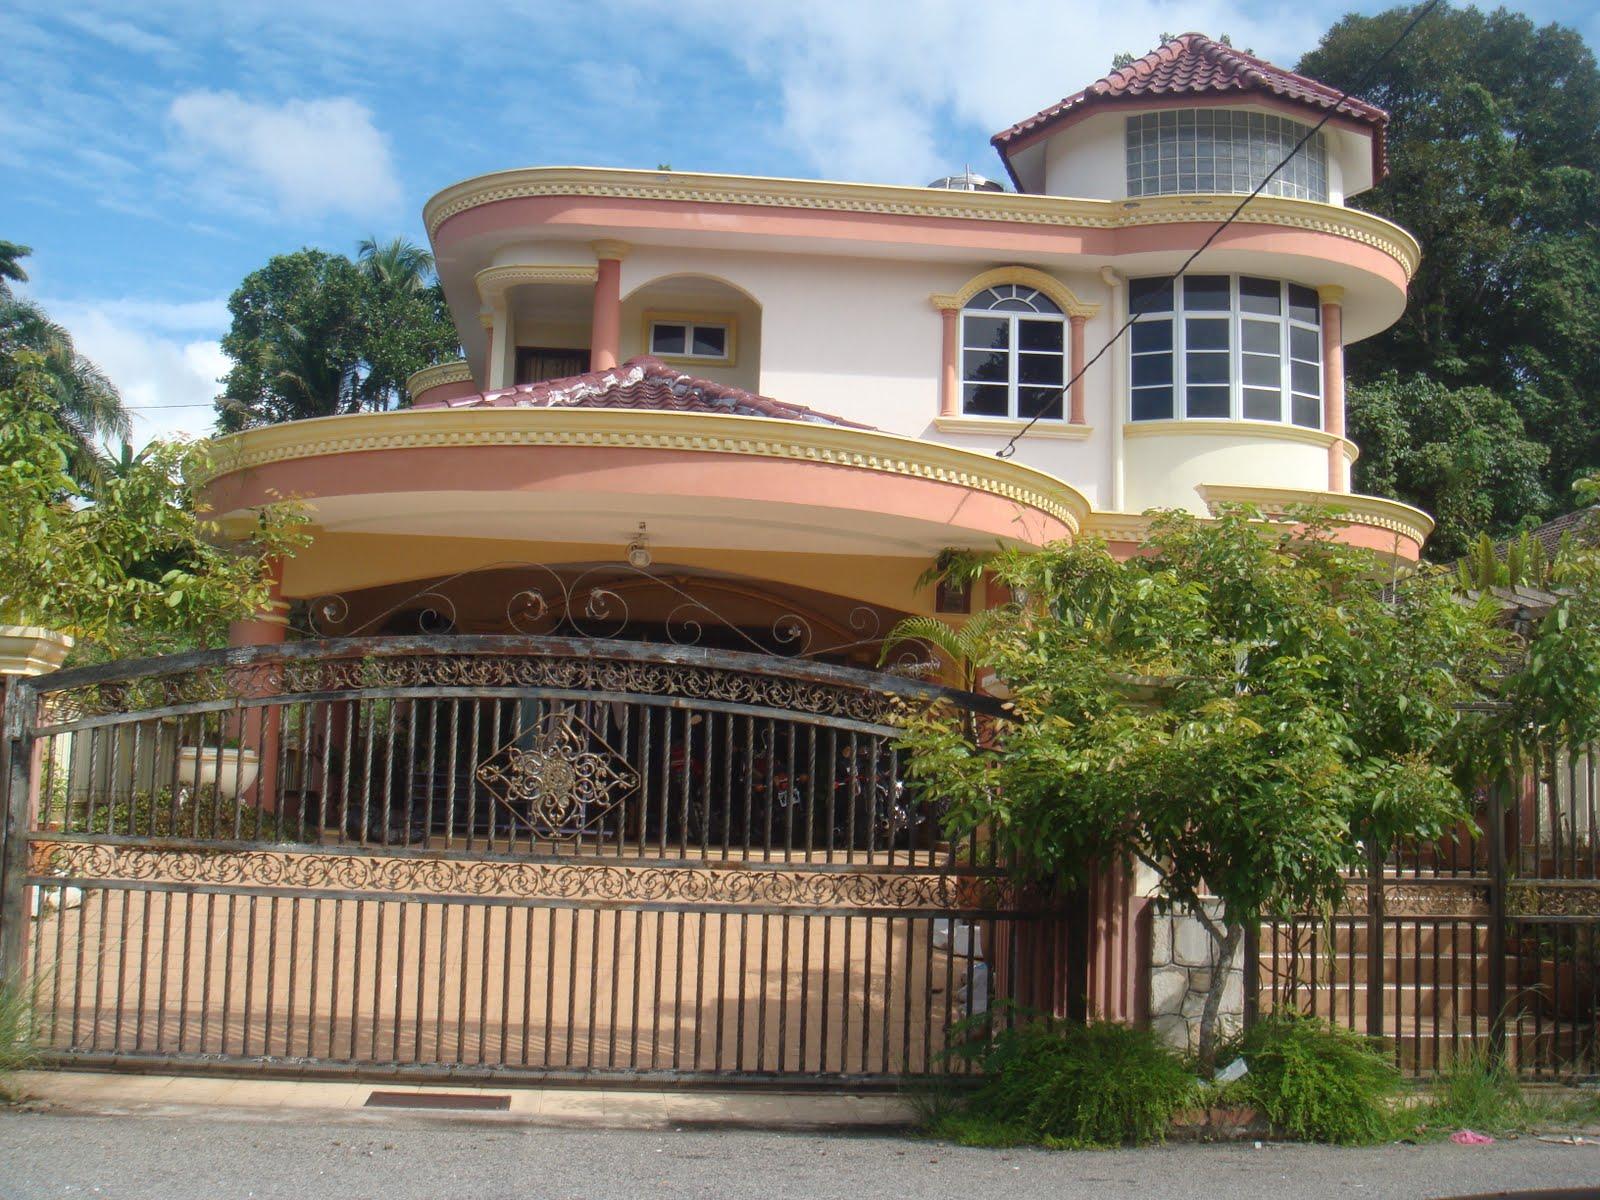 478 Foto Desain Rumah Siti Nurhaliza Bak Istana Paling